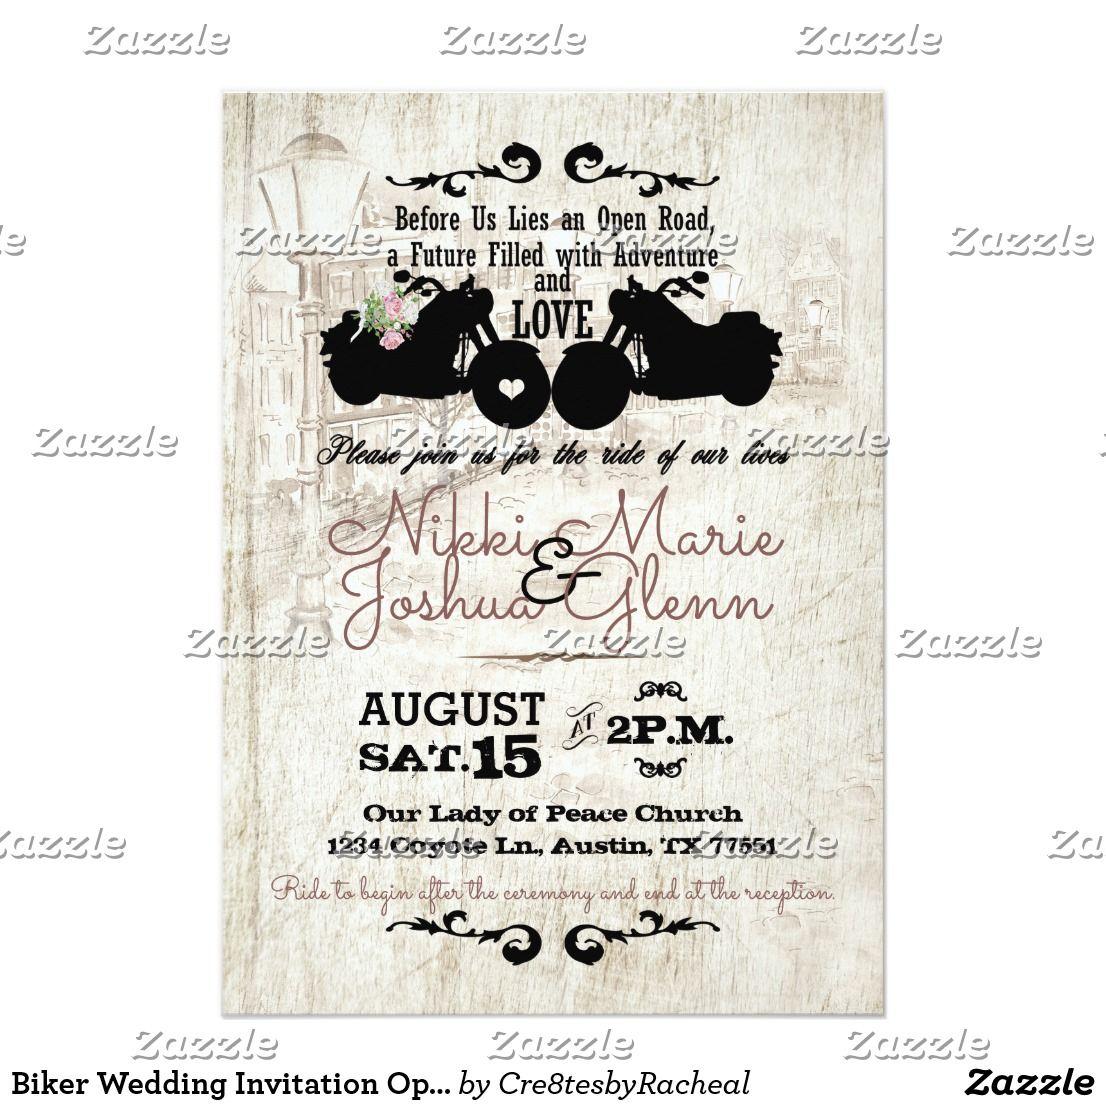 Biker Wedding Invitation Open Road Adventure Zazzle Com Biker